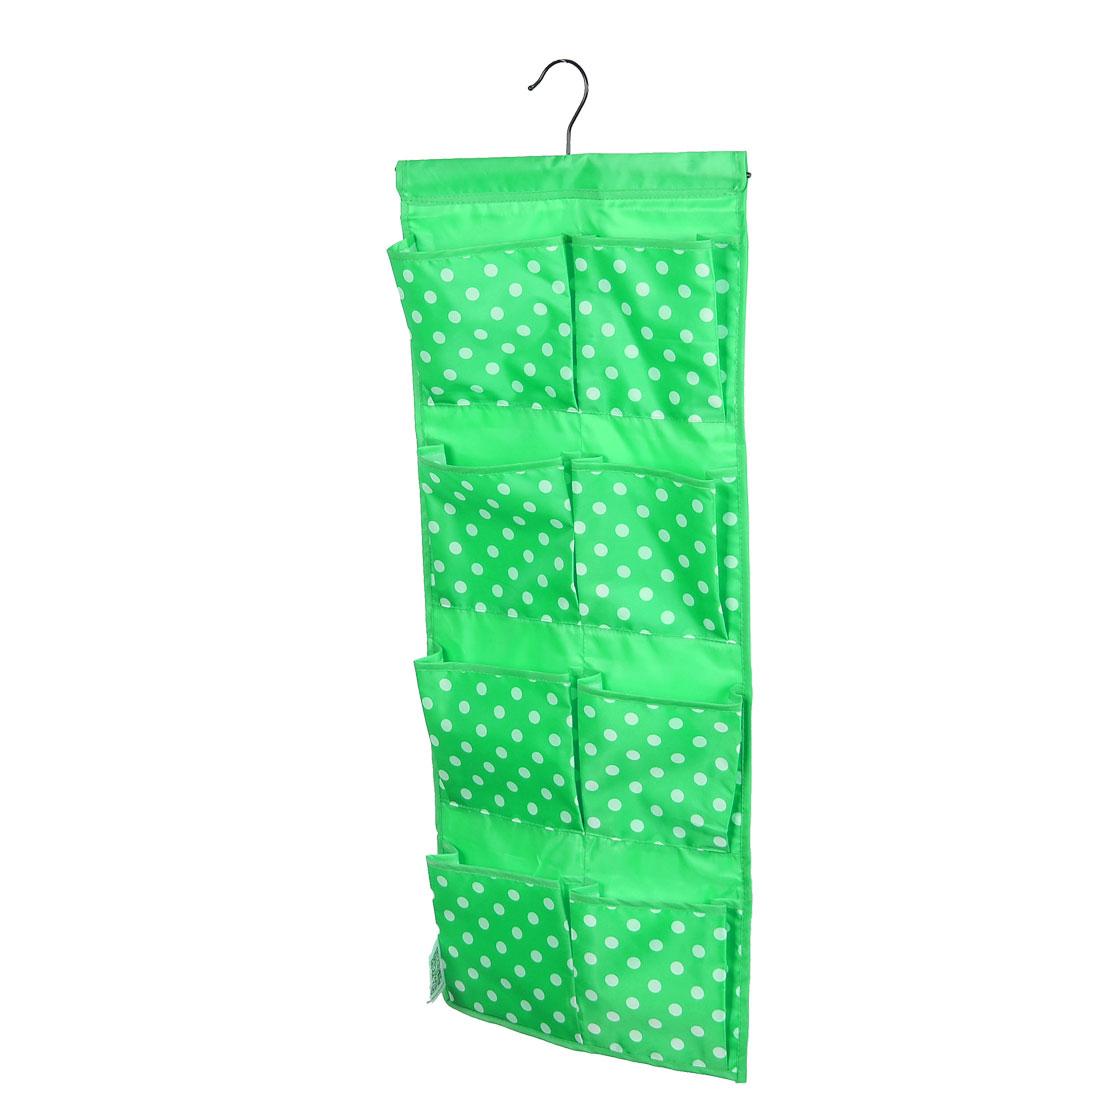 Dots Pattern Wall Door Closet 8 Pockets Hanging Storage Bag Case Green